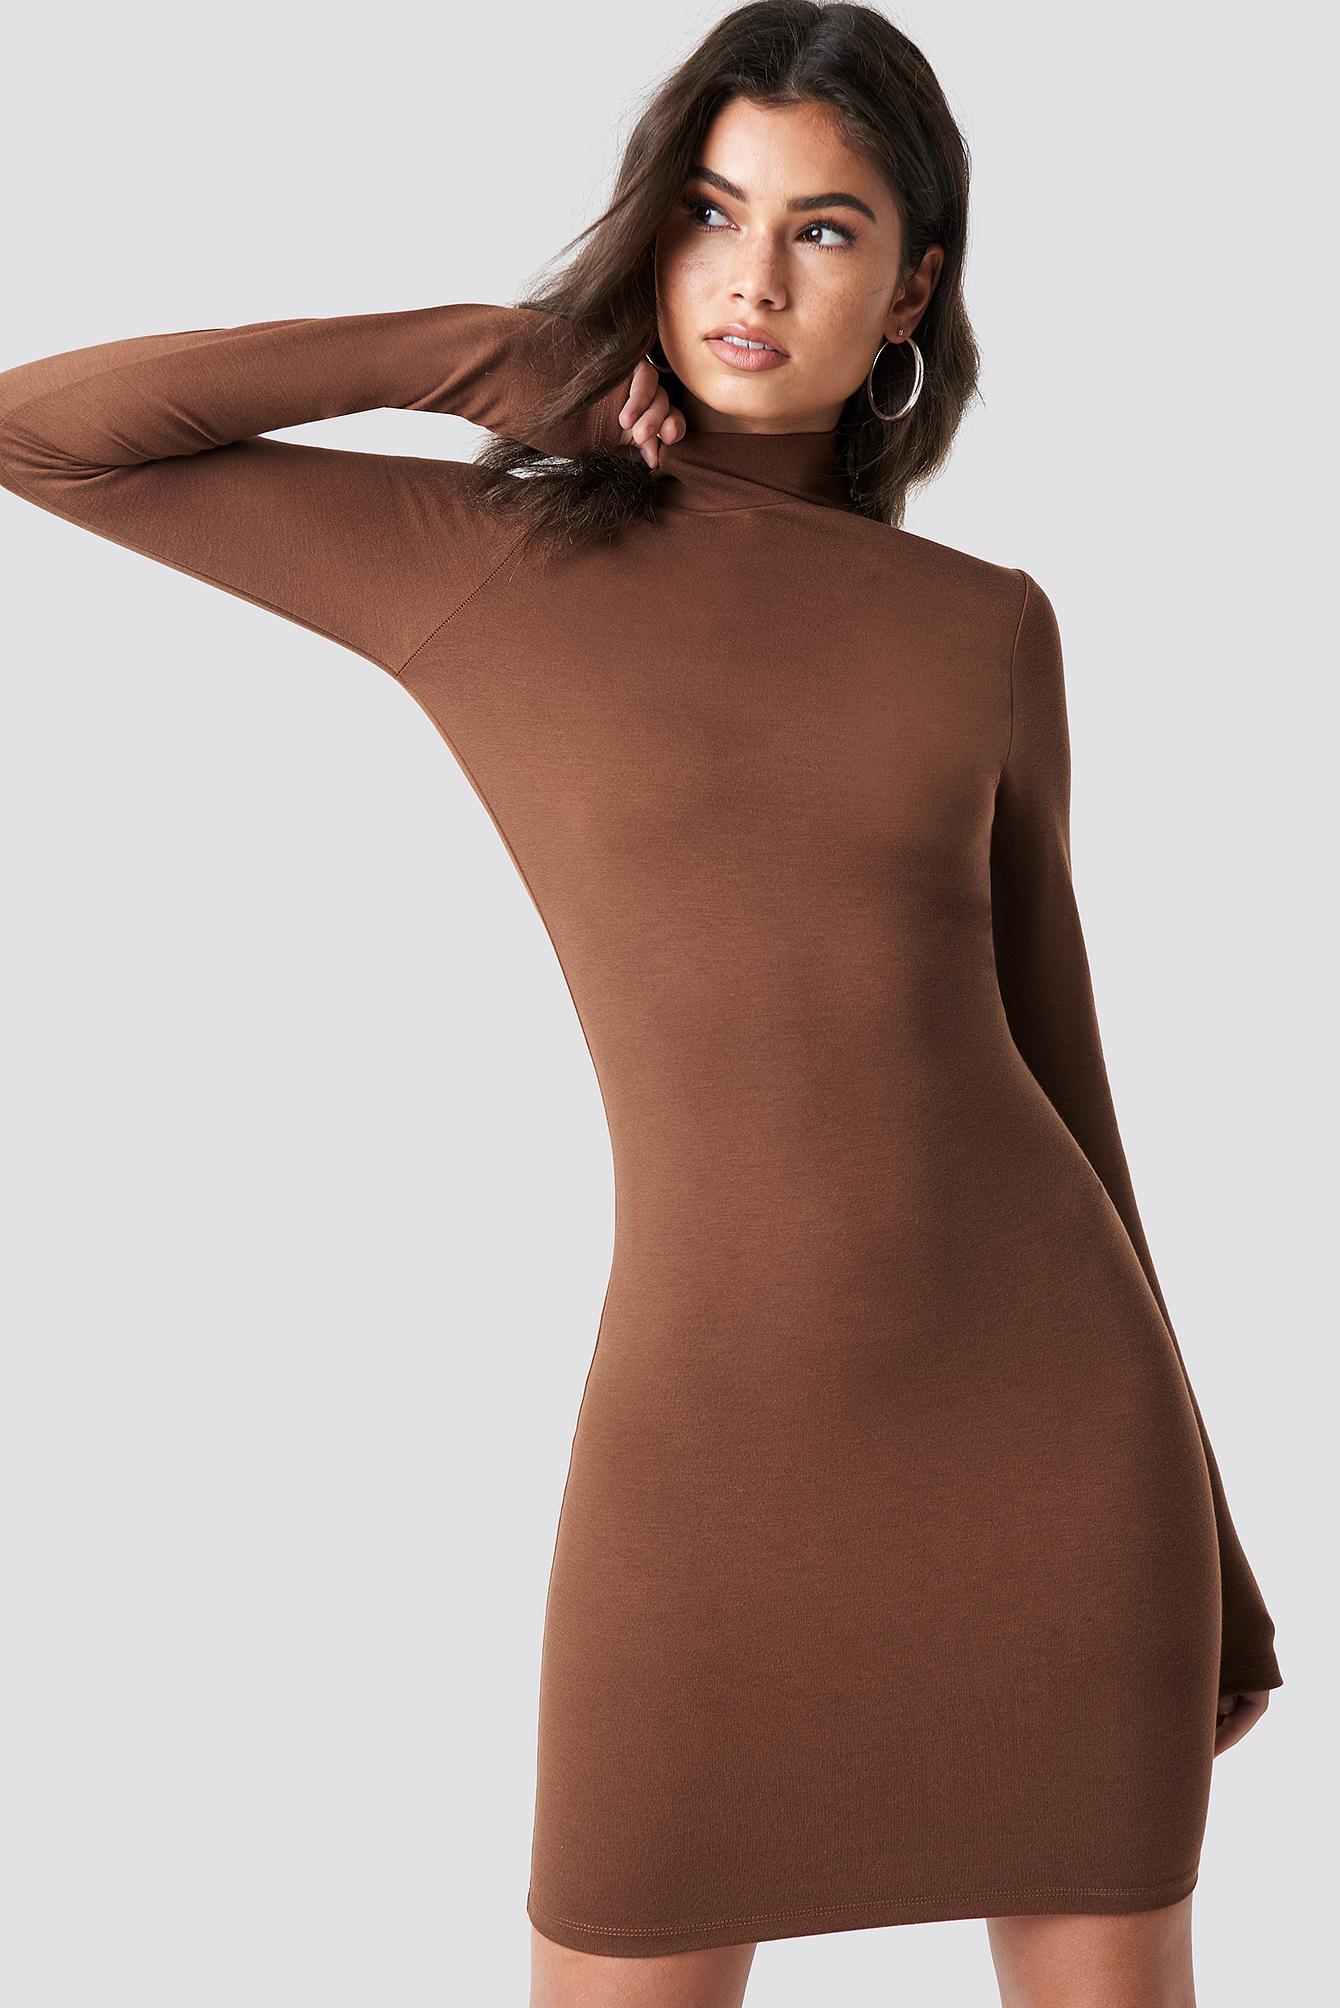 NICKIXNAKD High Neck Bodycon Dress - Brown